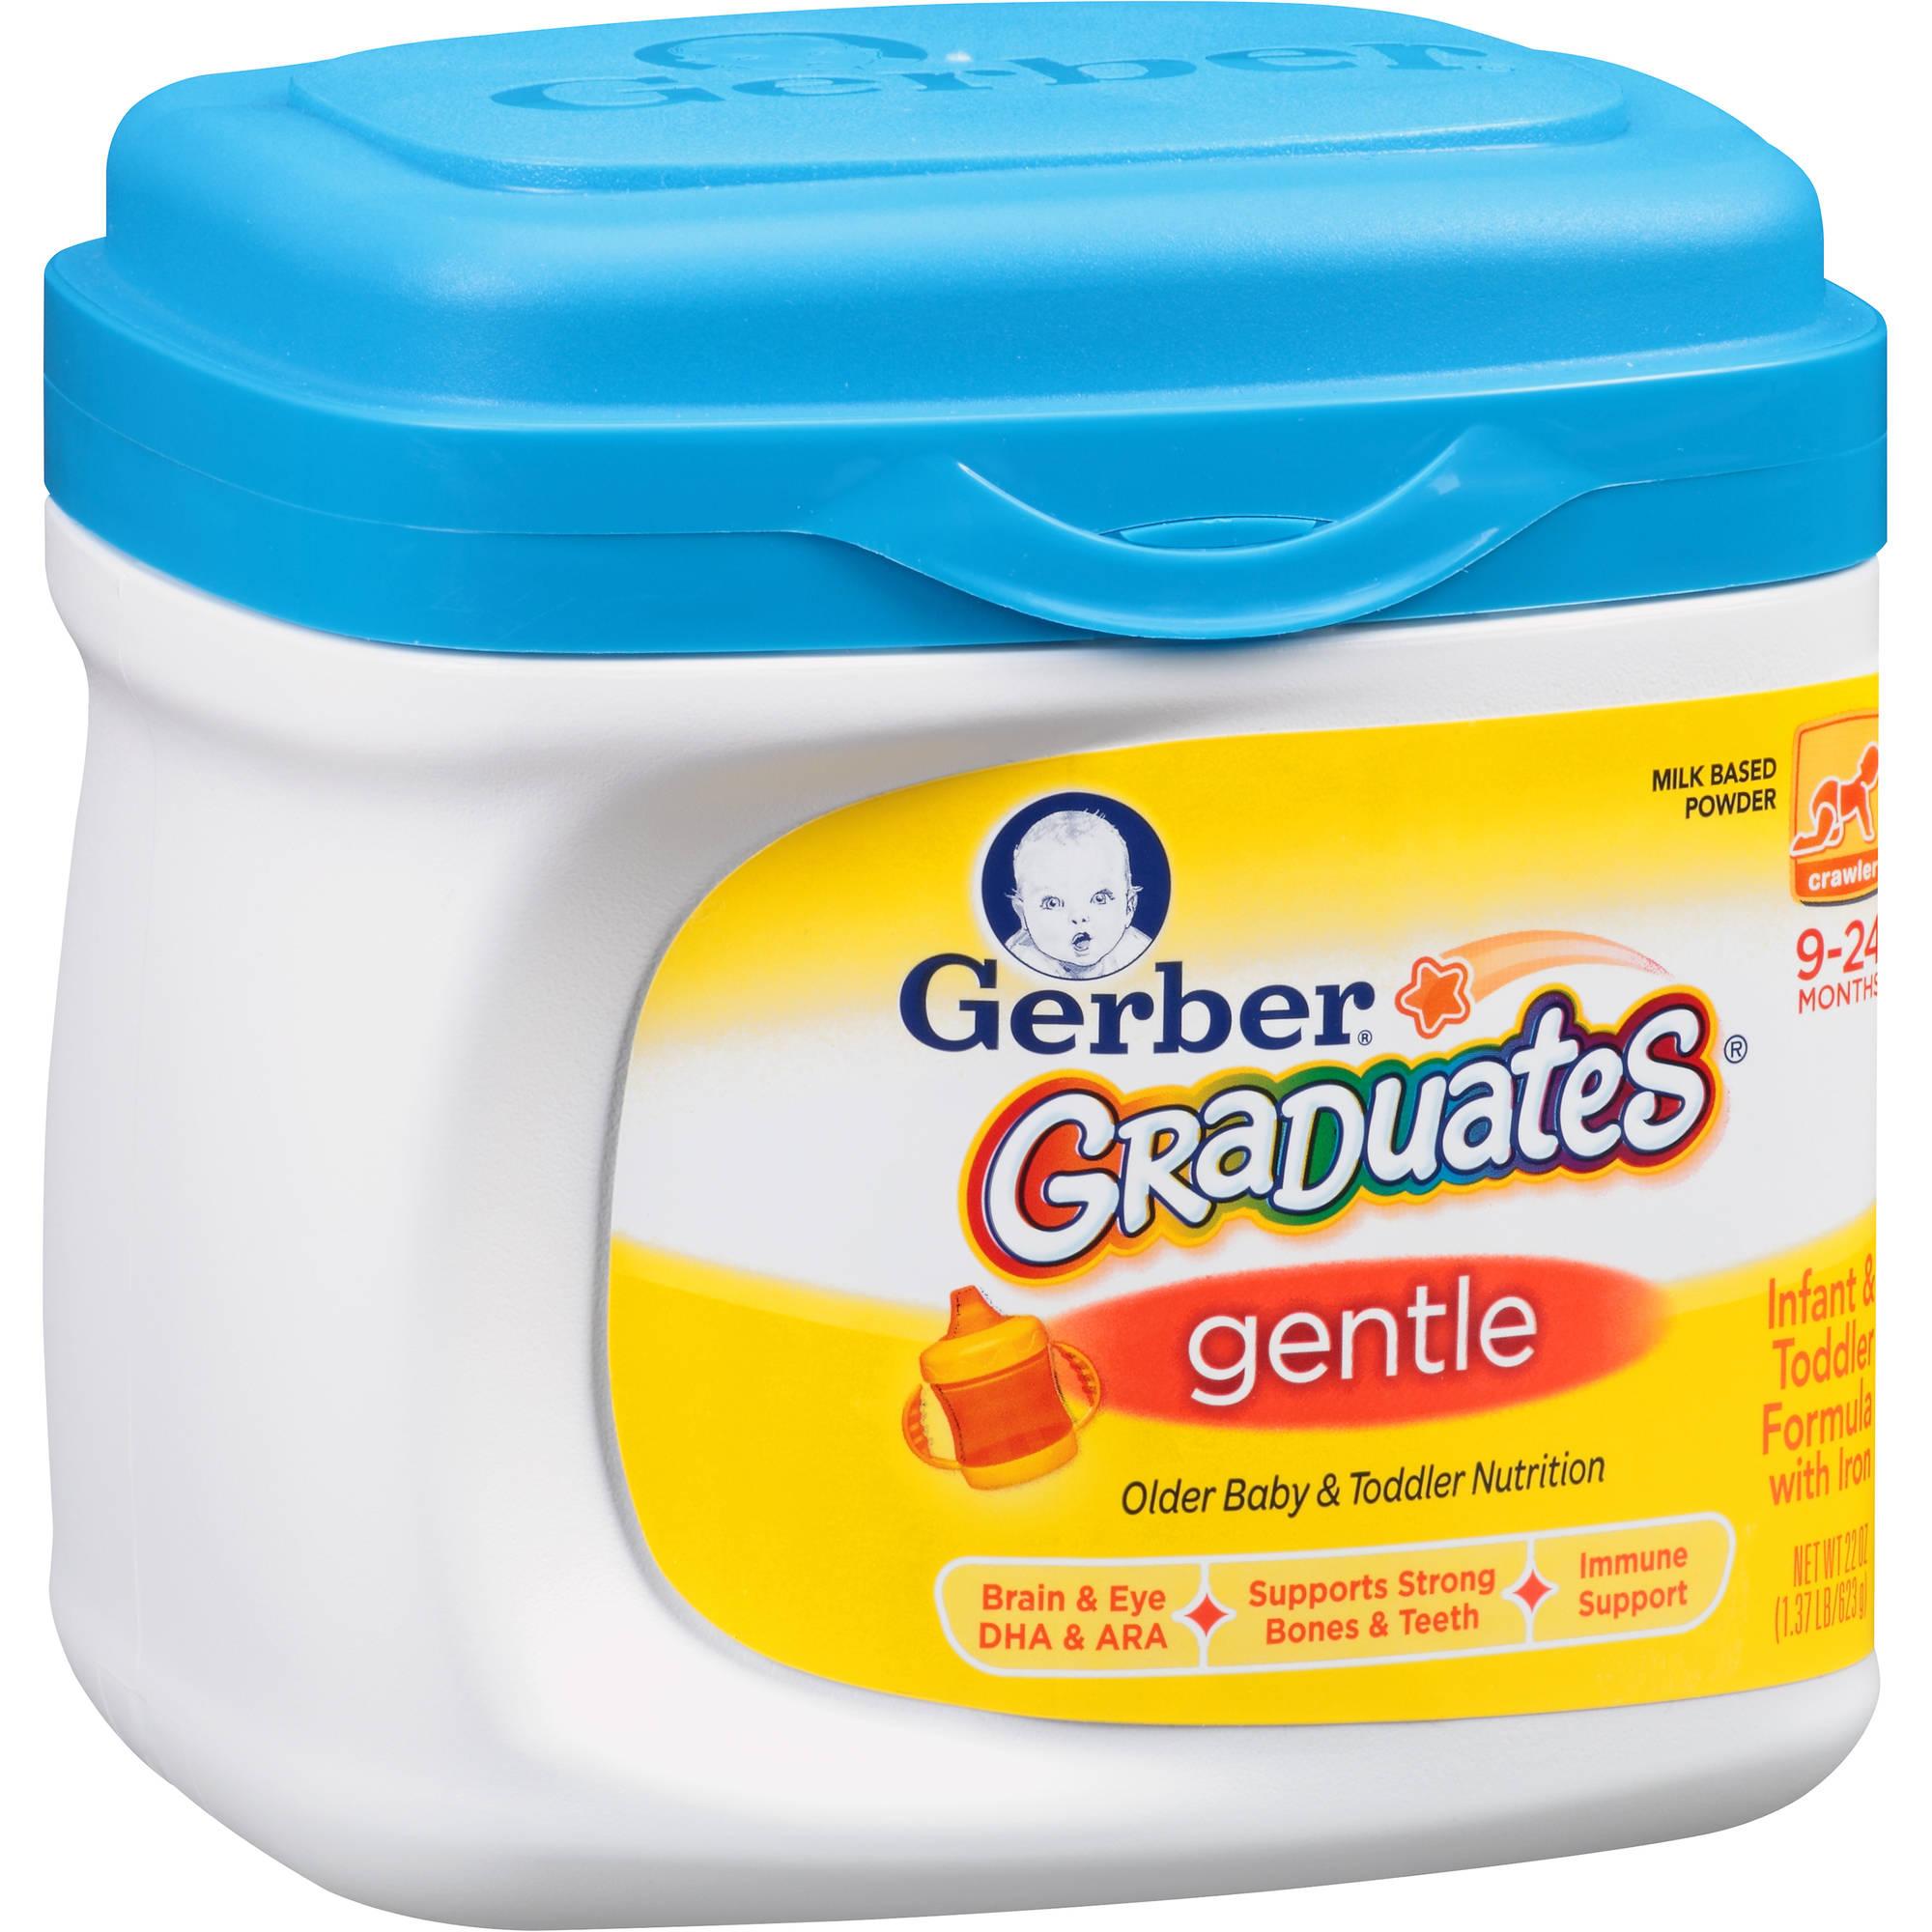 Gerber Graduates Gentle Powder Older Baby and Toddler Formula, 22 Ounce